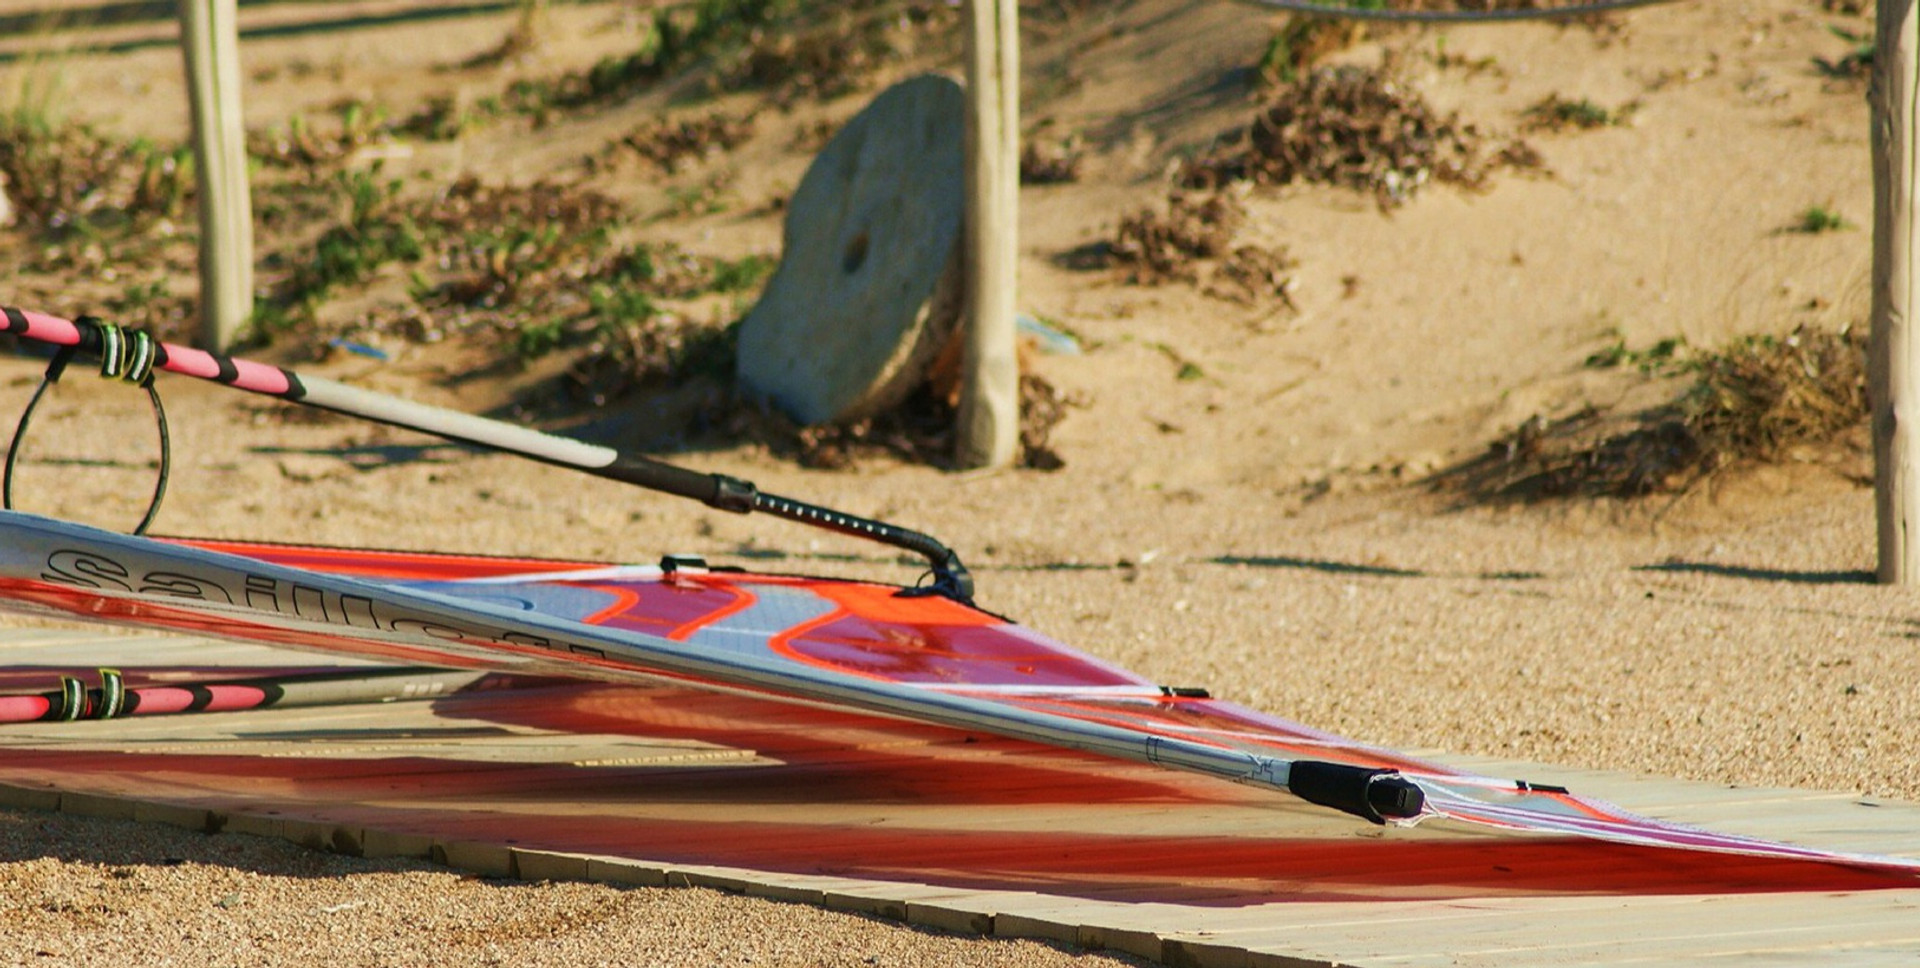 windsurf%20sulla%20spiaggia%201_edited.j